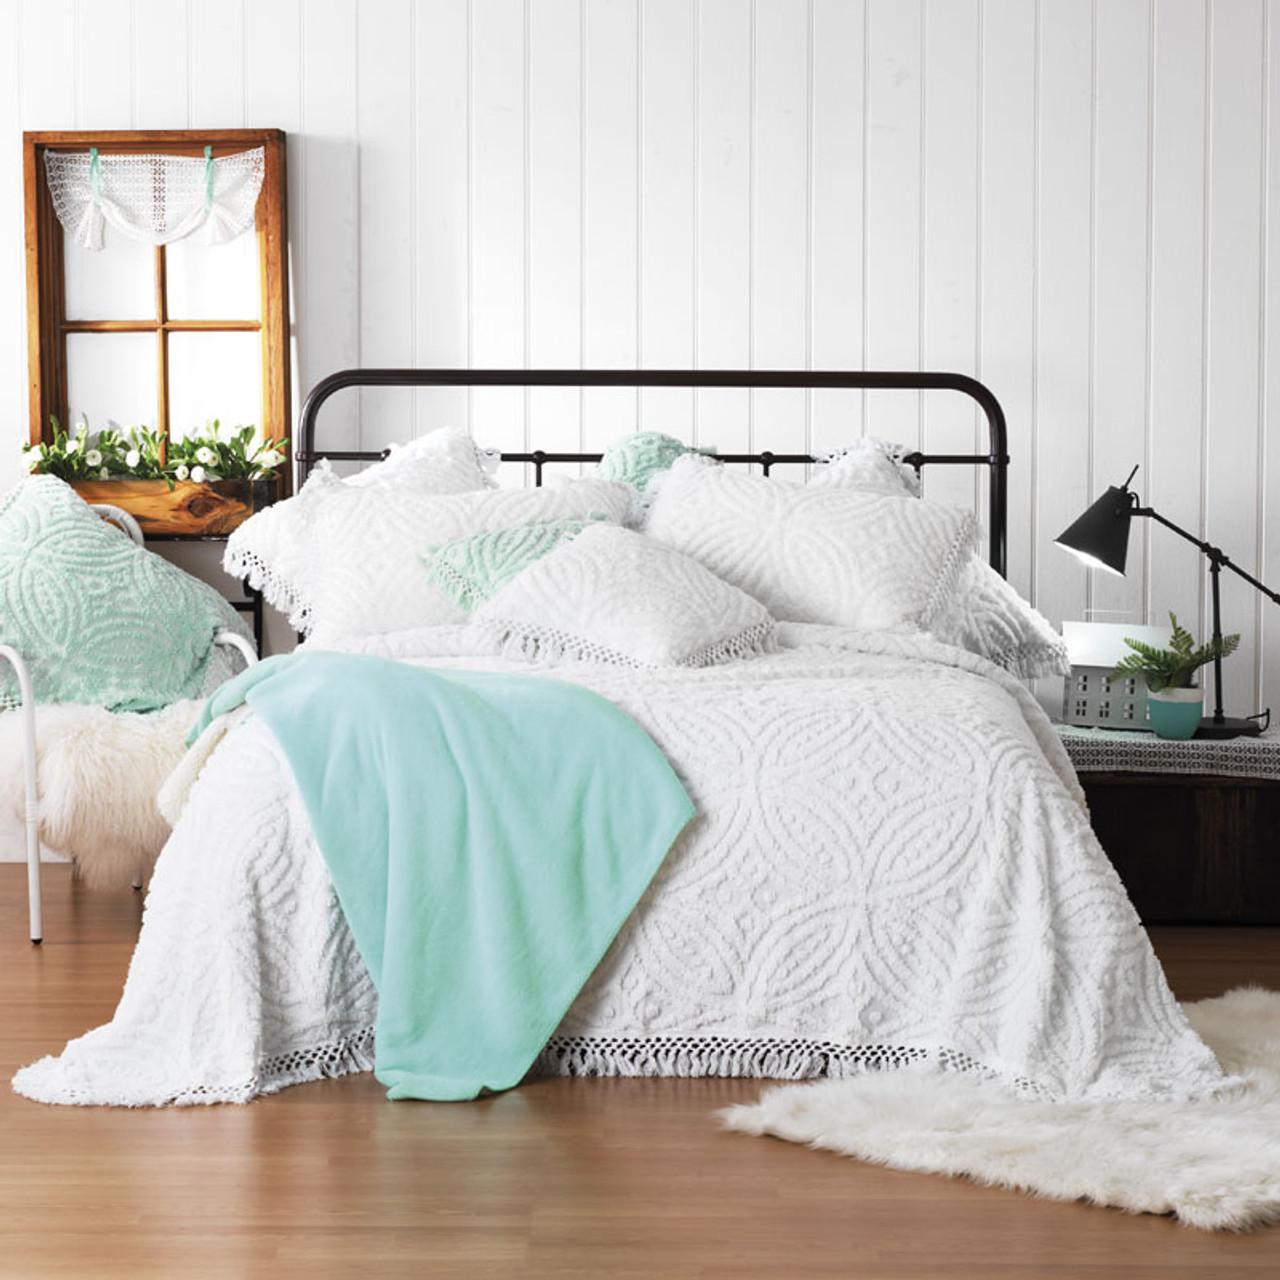 Kalia White Bedspread Set By Bianca Queen Bed My Linen